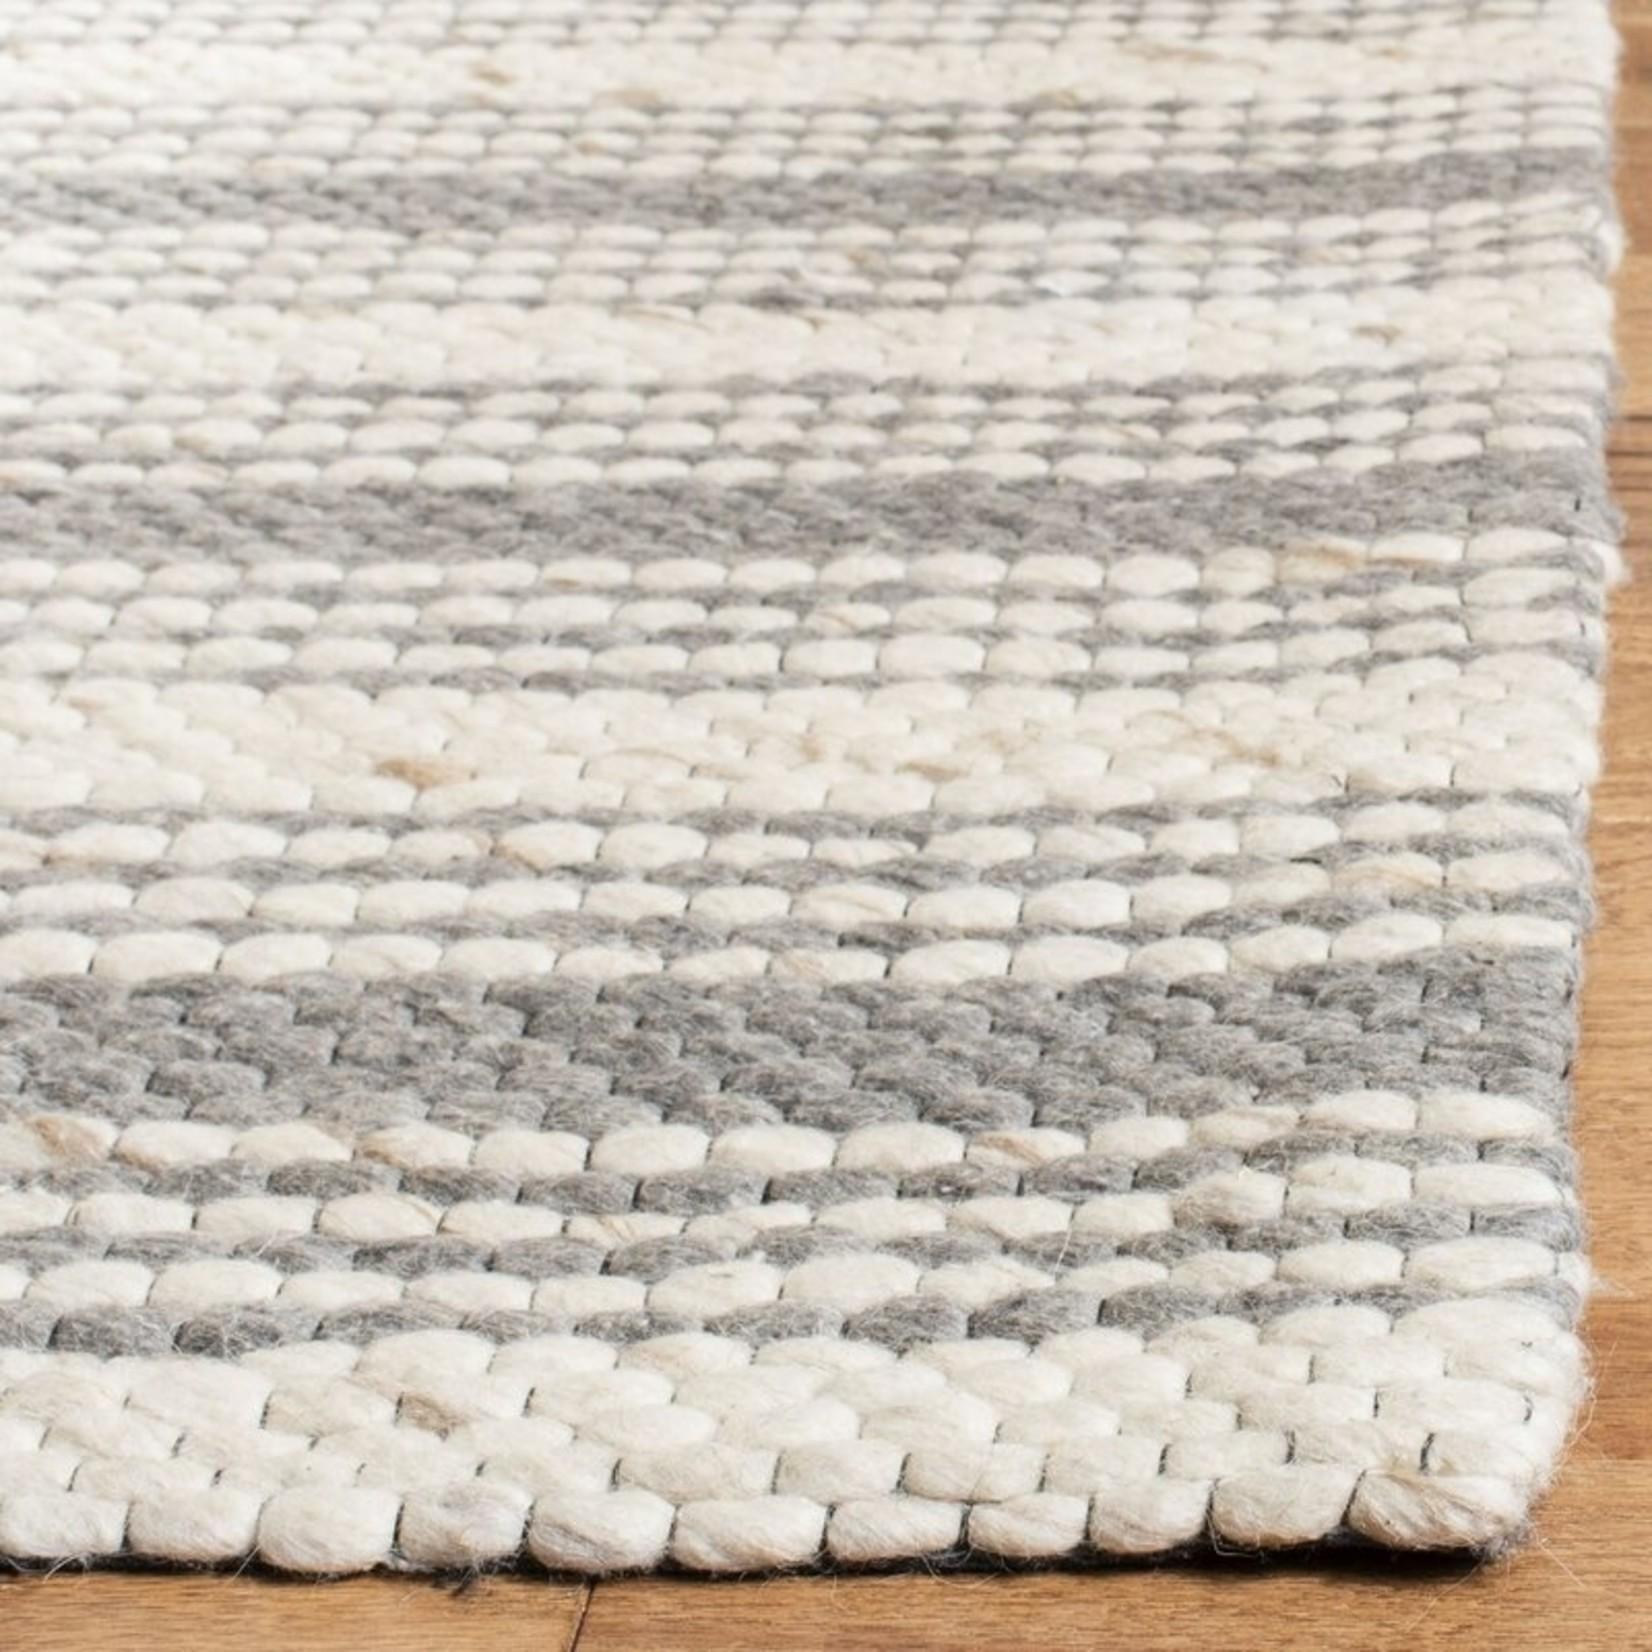 *3' x 5' - Marbella Handwoven Flatweave Gray/Taupe/Neutral Tone Area Rug